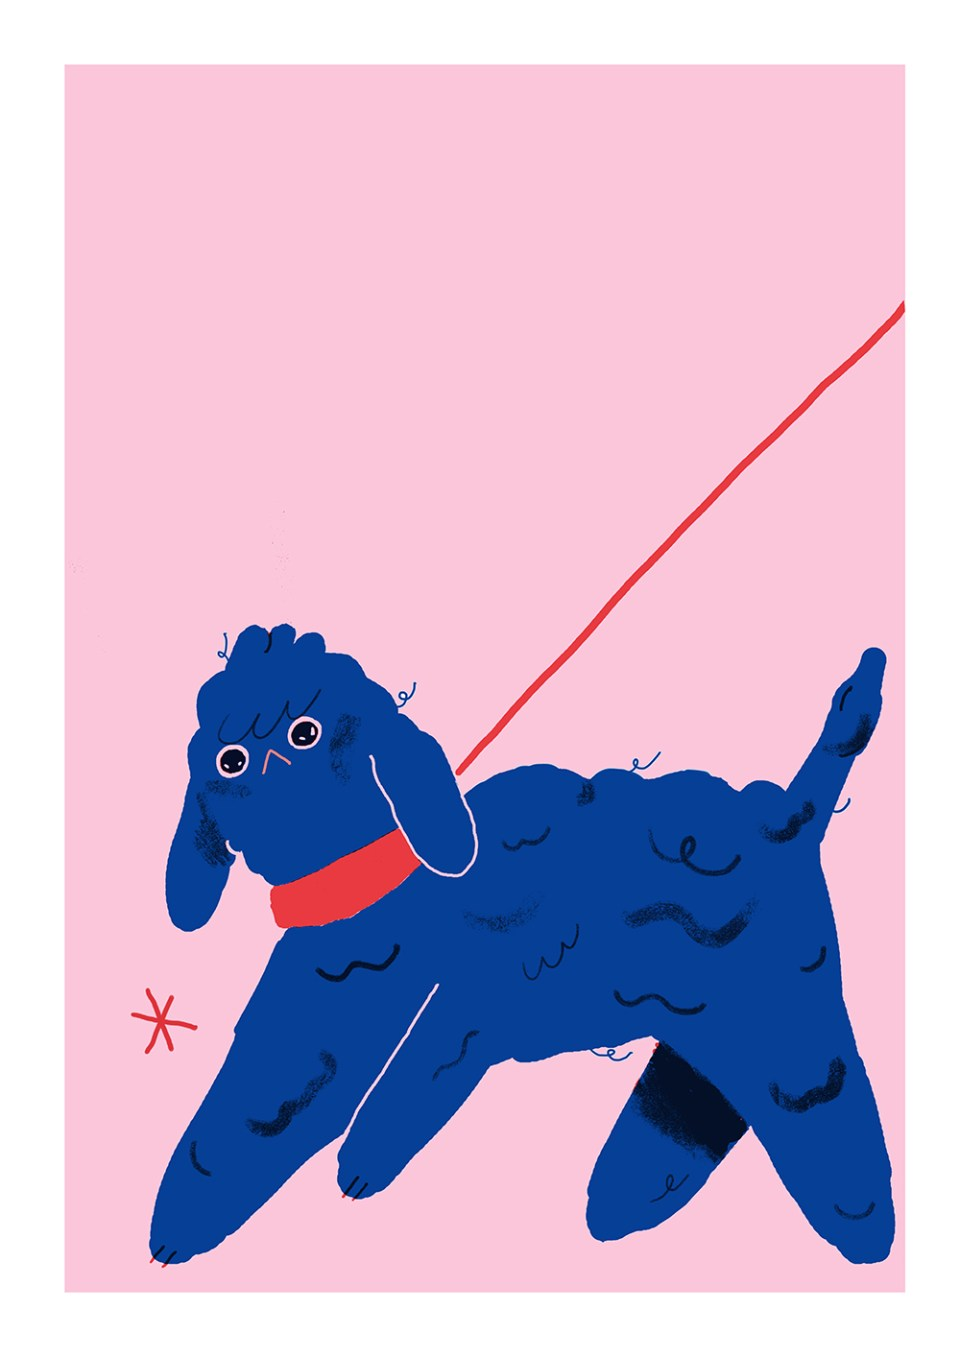 Dream Safari Illustration exhibition artist Helena Covell